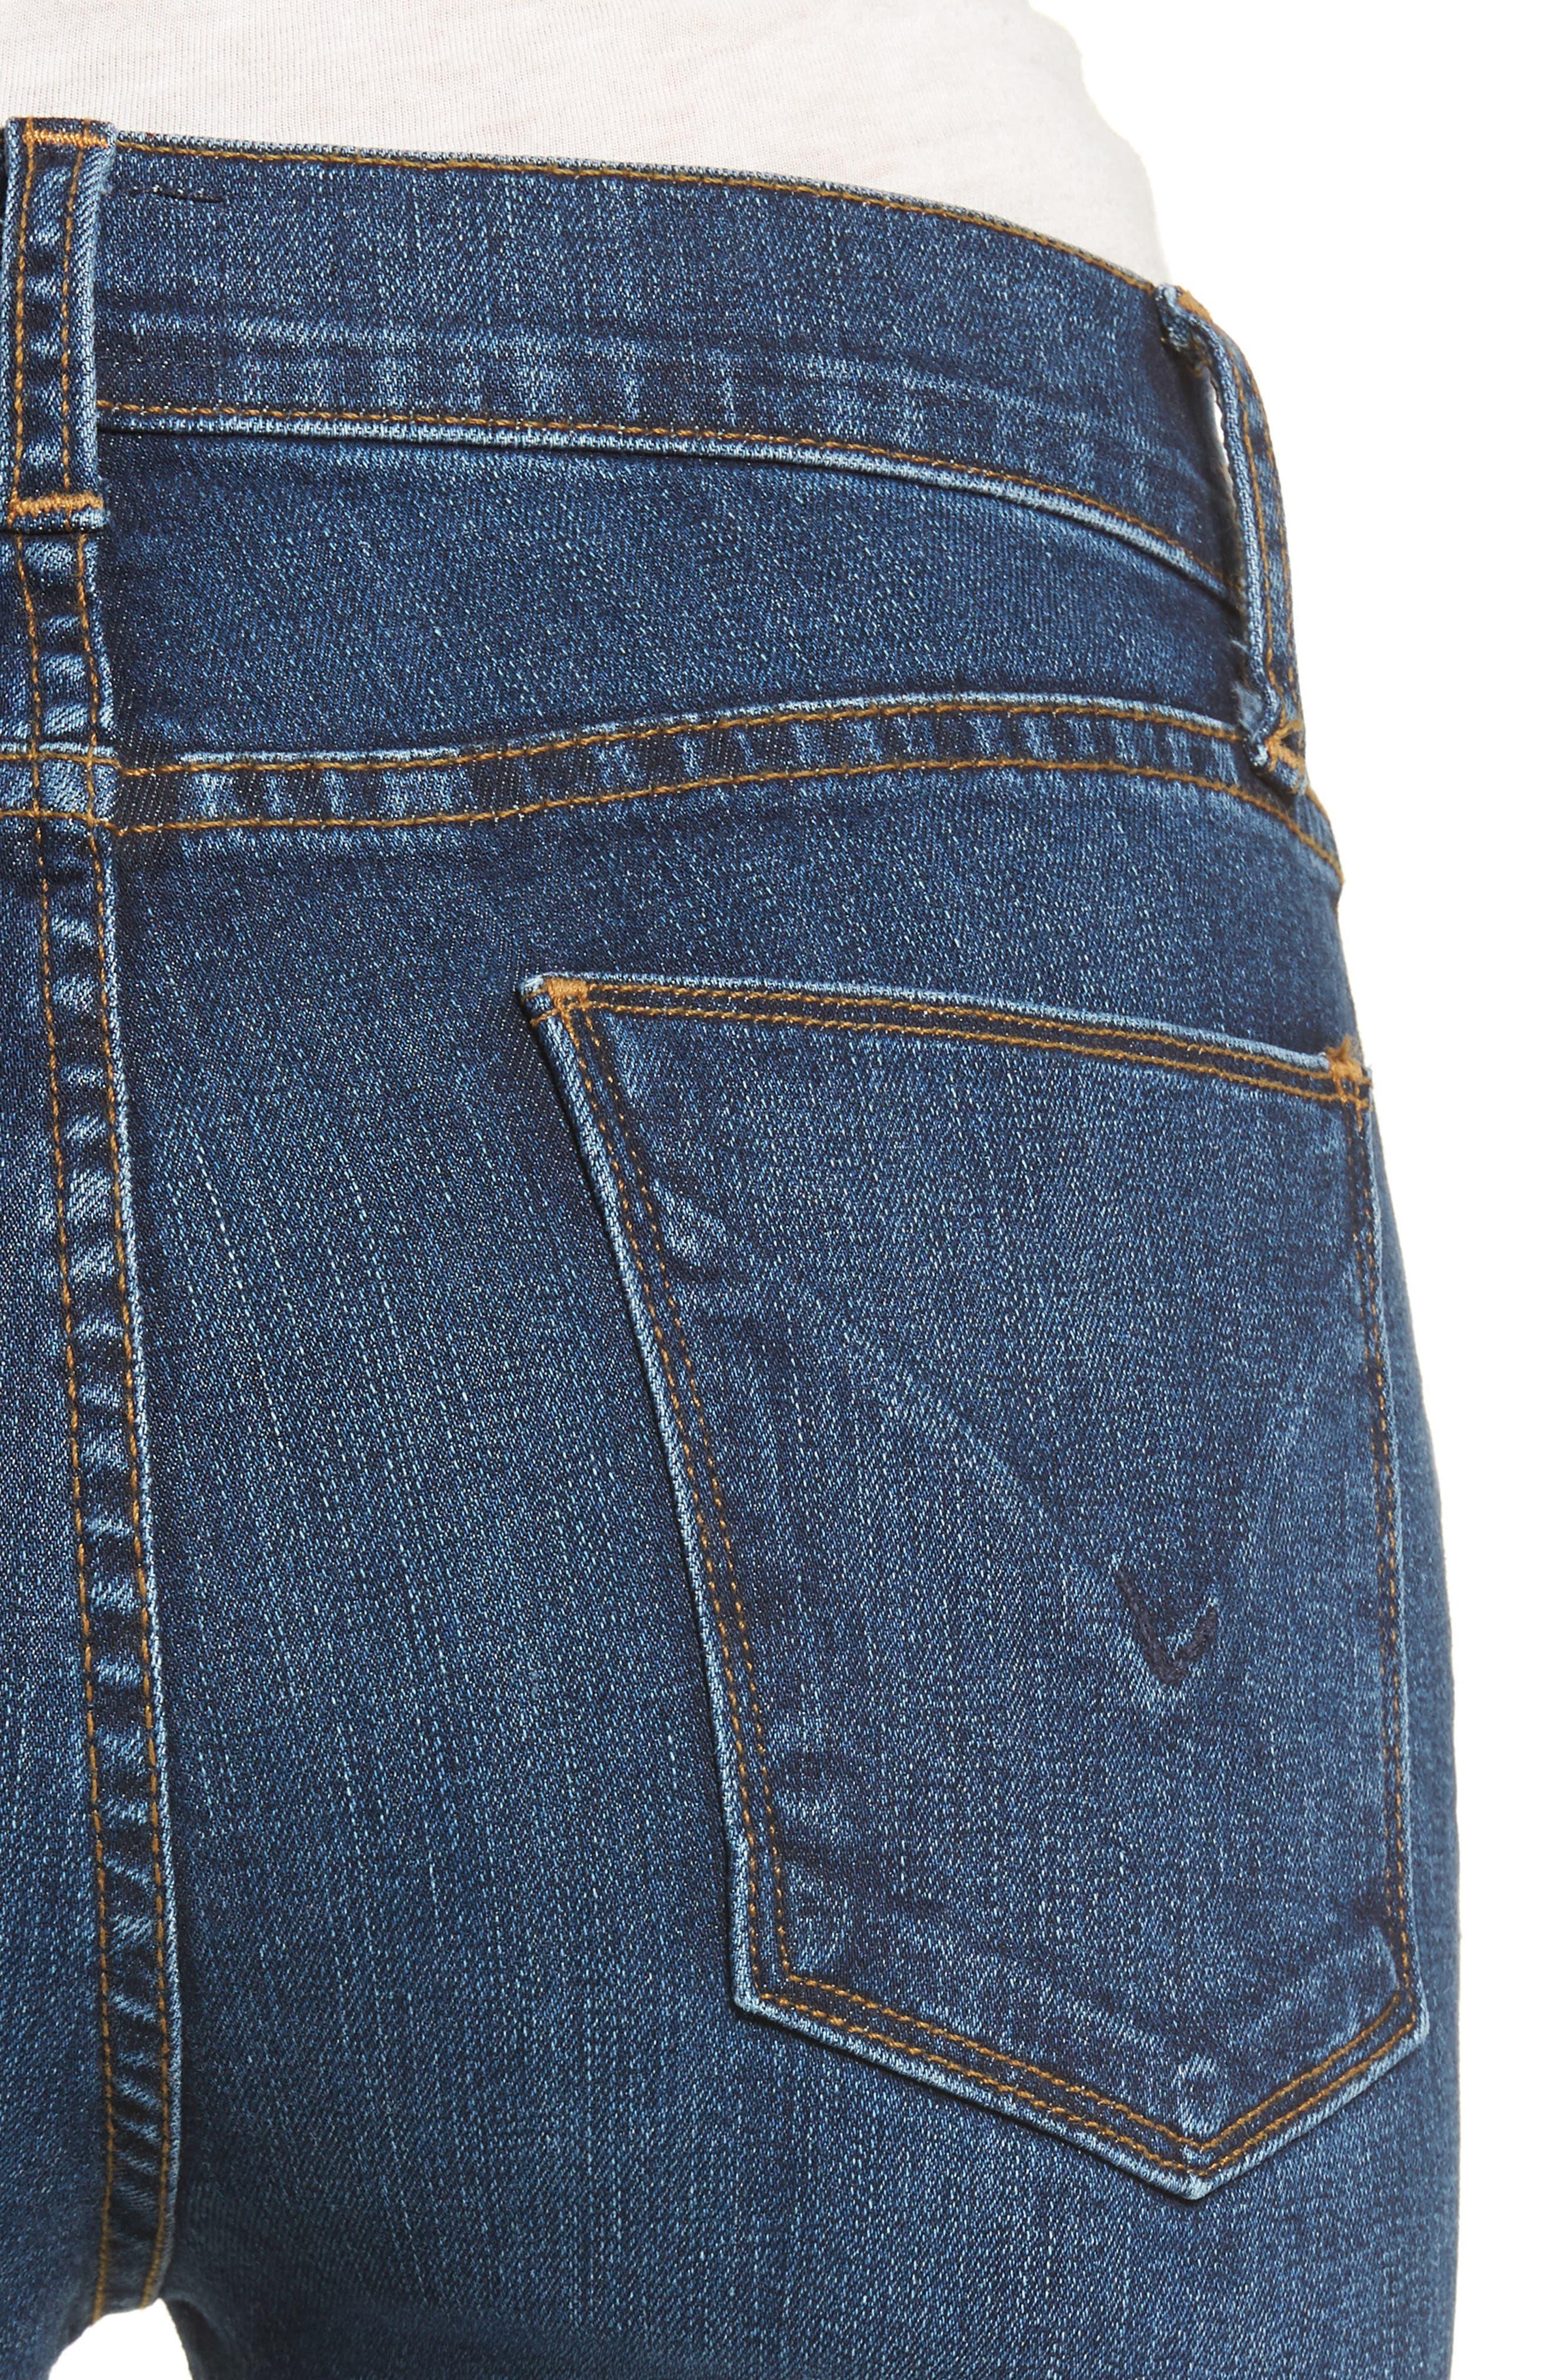 Barbara High Waist Super Skinny Jeans,                             Alternate thumbnail 4, color,                             400